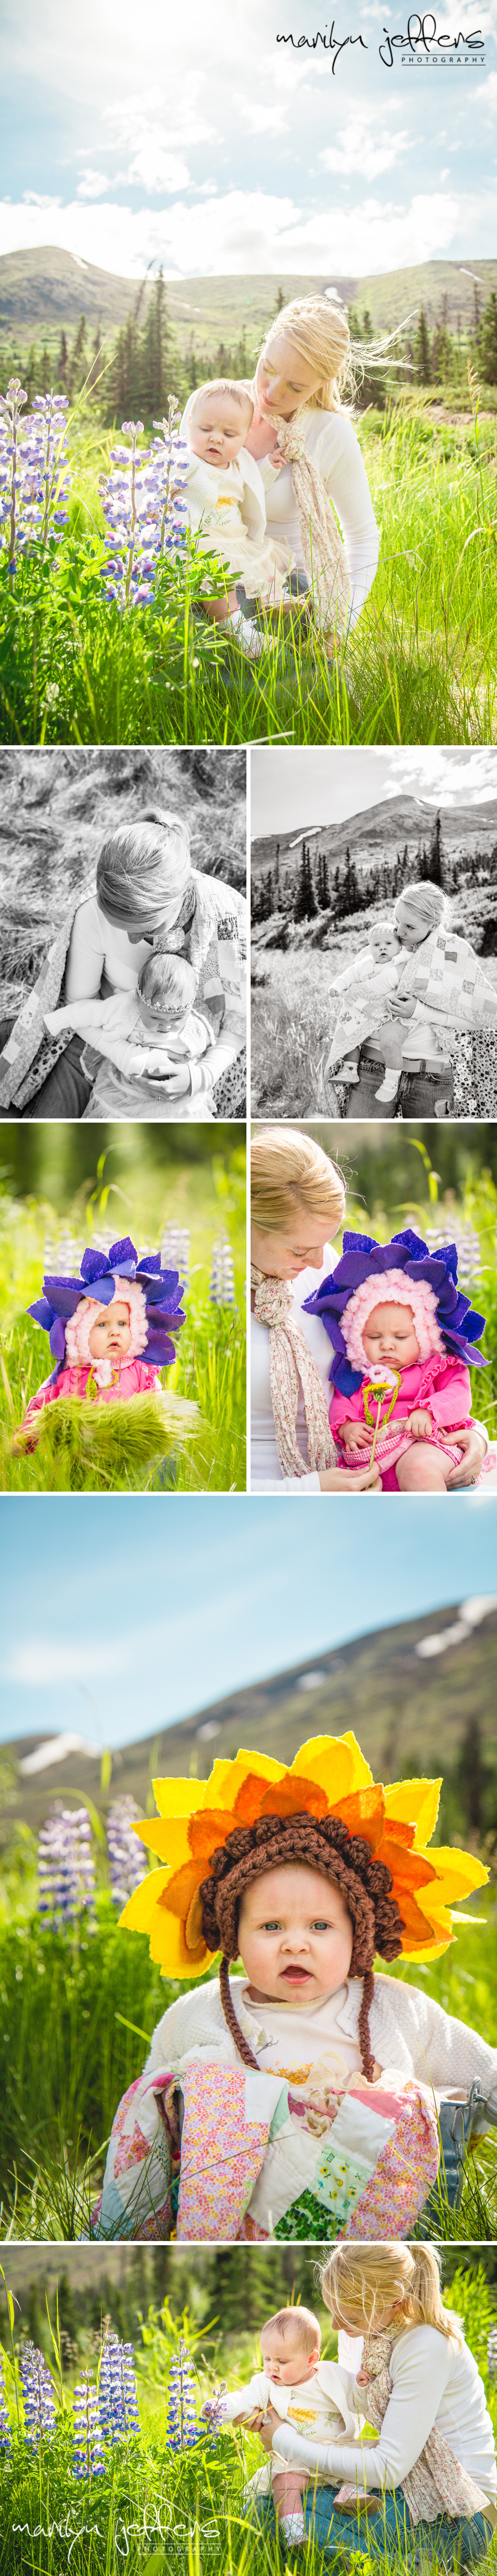 #Family Picture Ideas: Modern Mountain Family